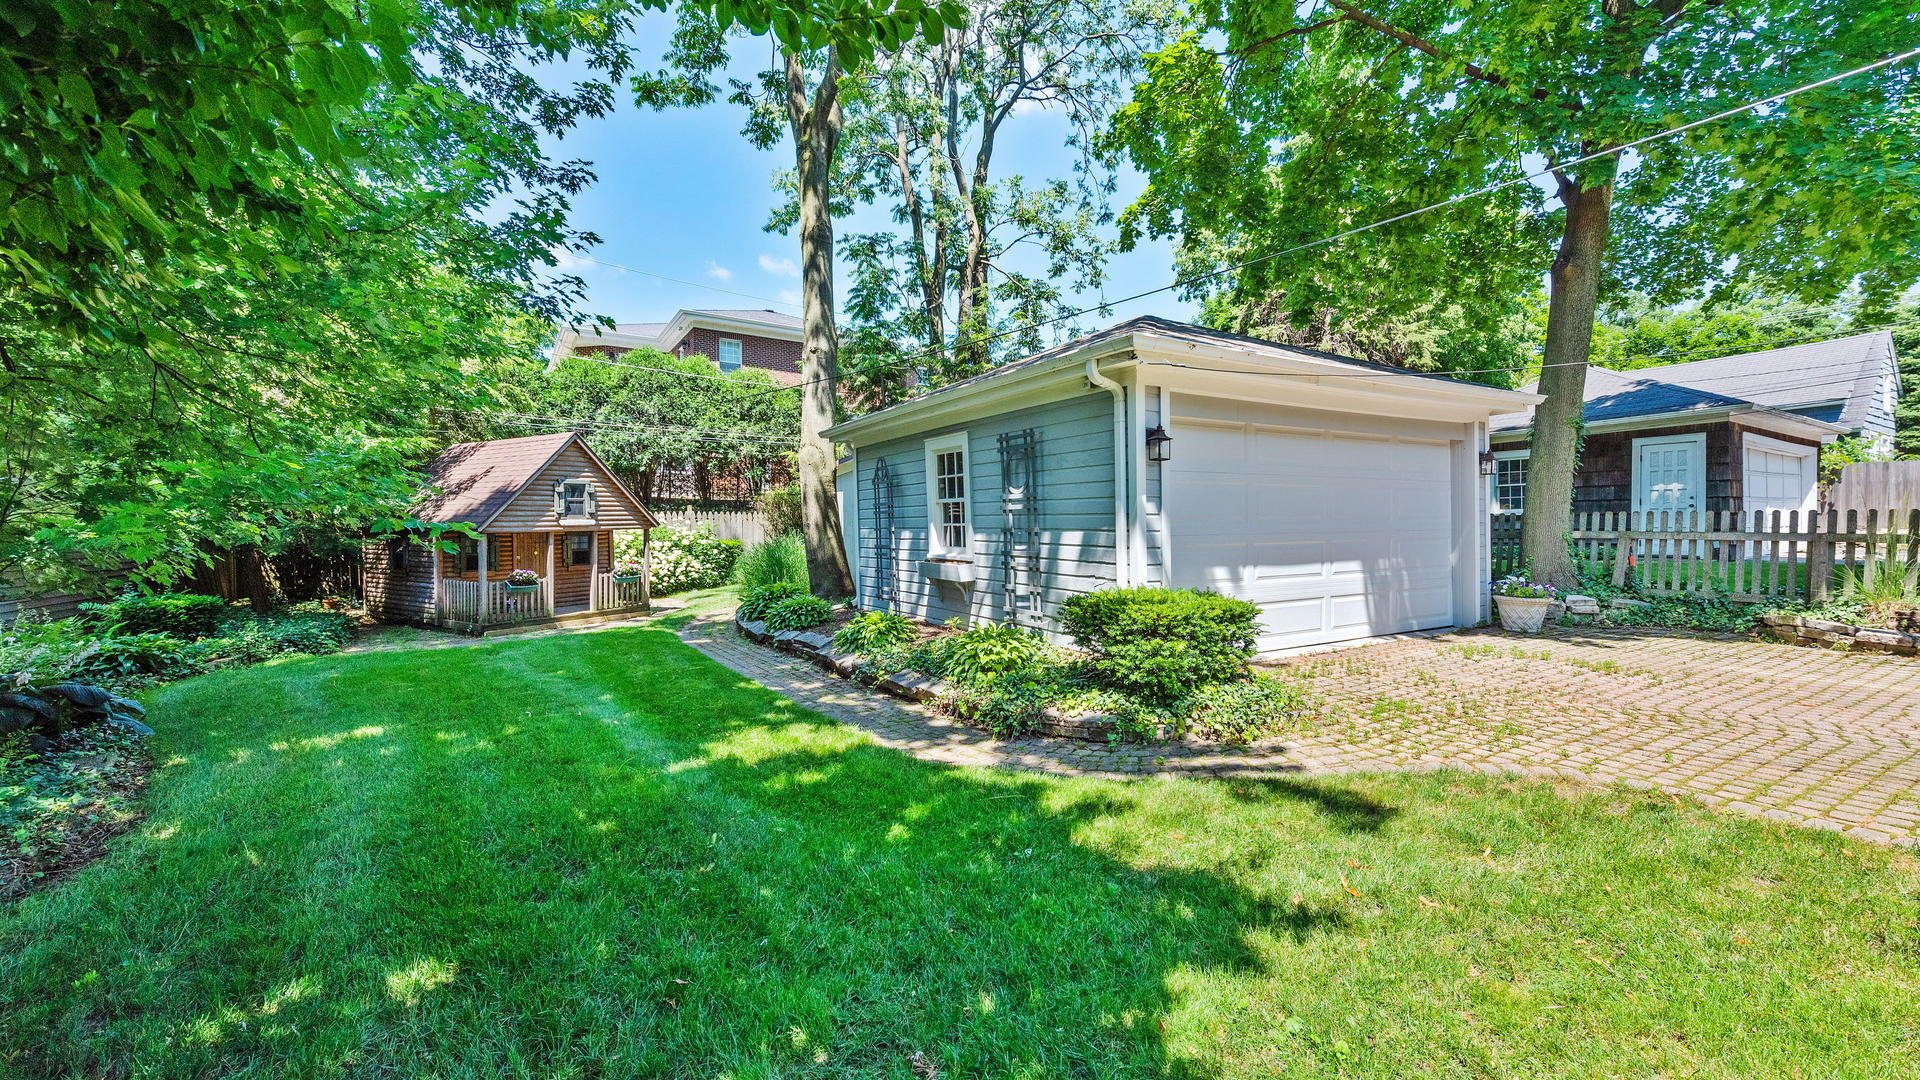 10 South Elm, Hinsdale, Illinois, 60521